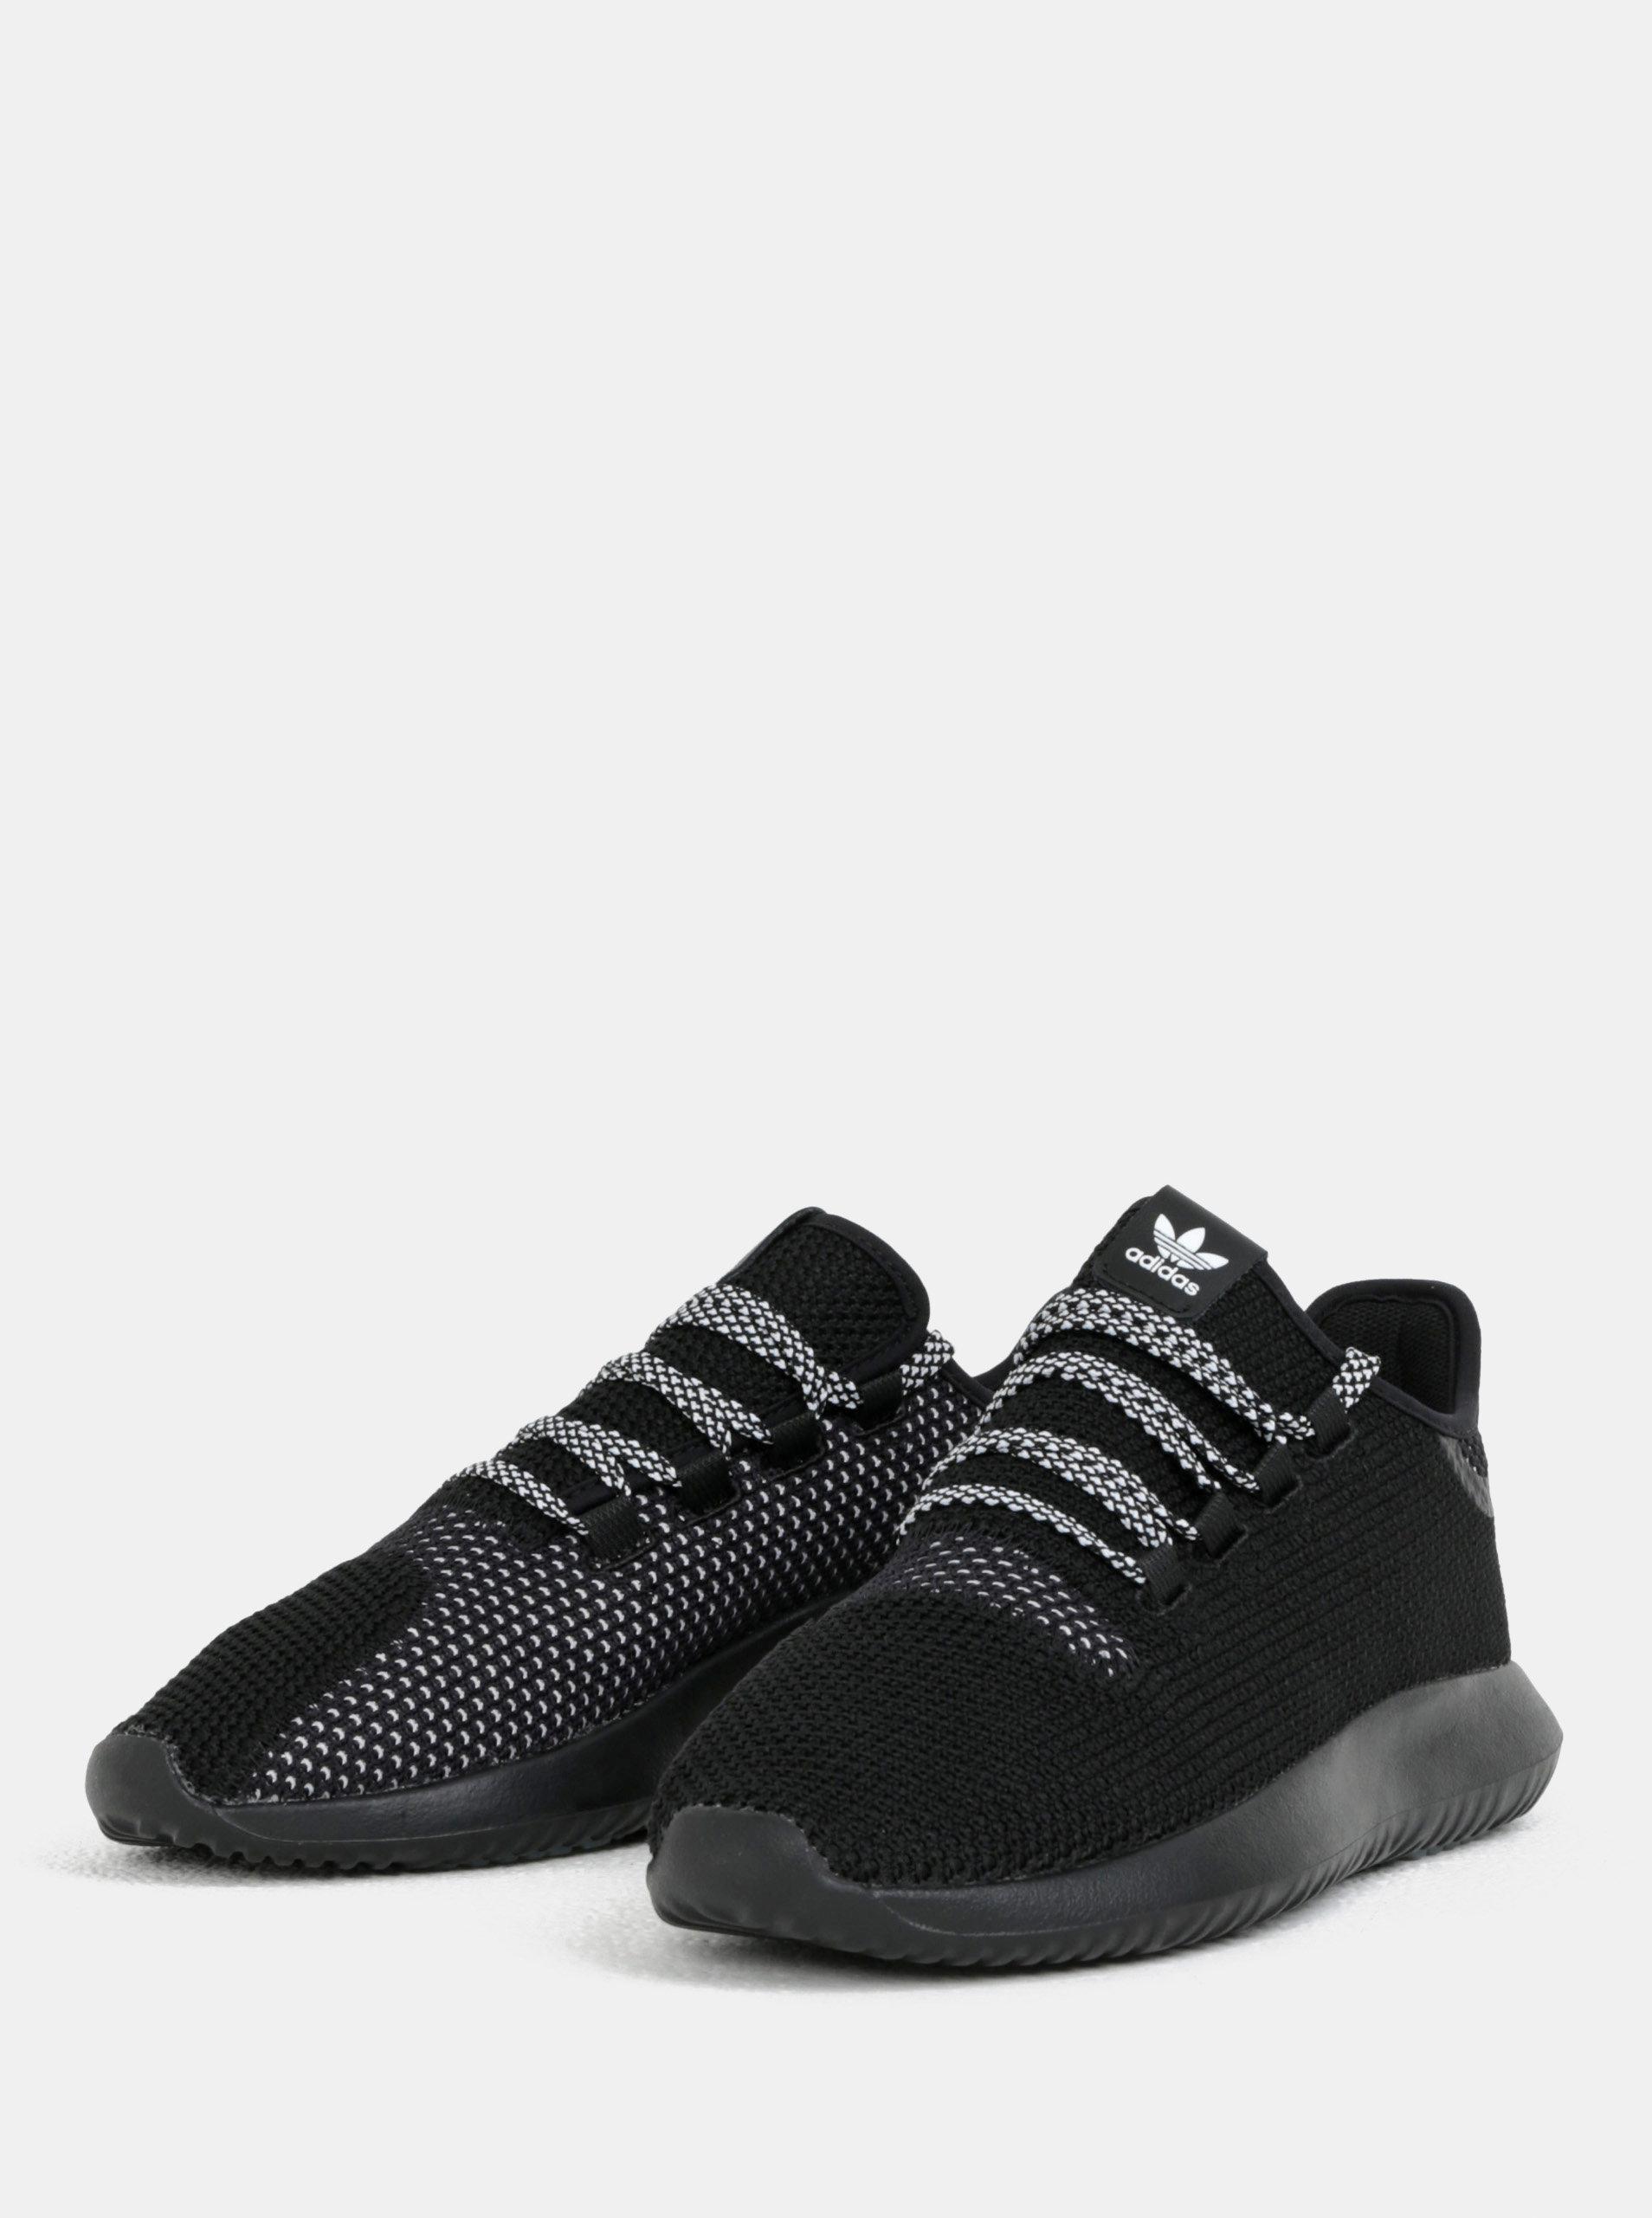 Černé pánské tenisky adidas Originals Tubular Shadow ... c28377eafe